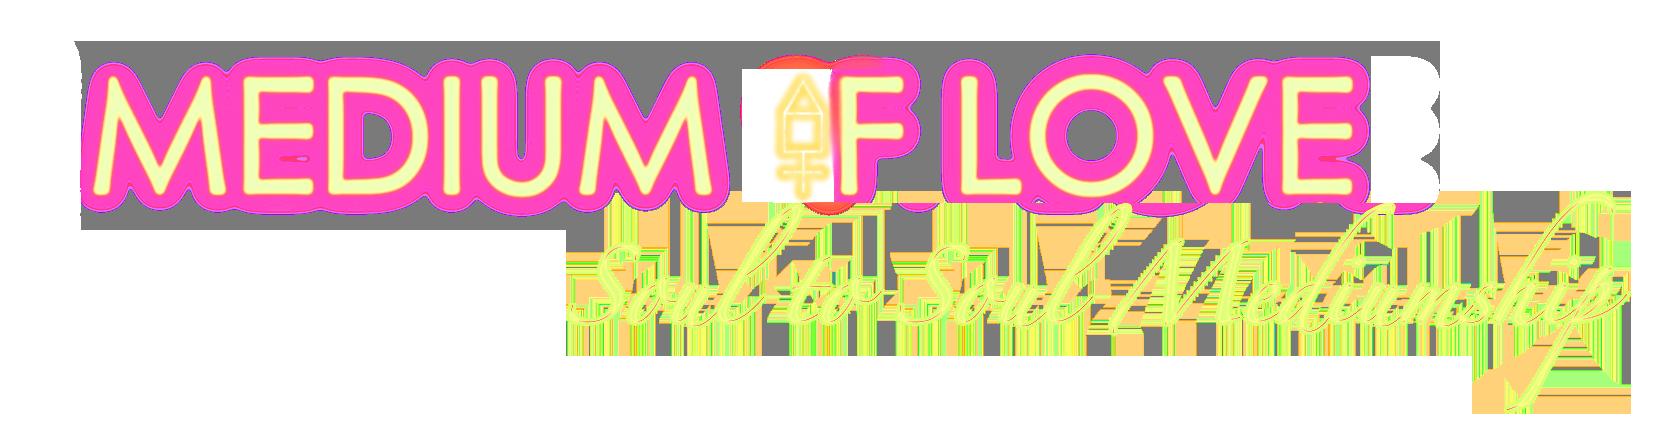 medium of love banner